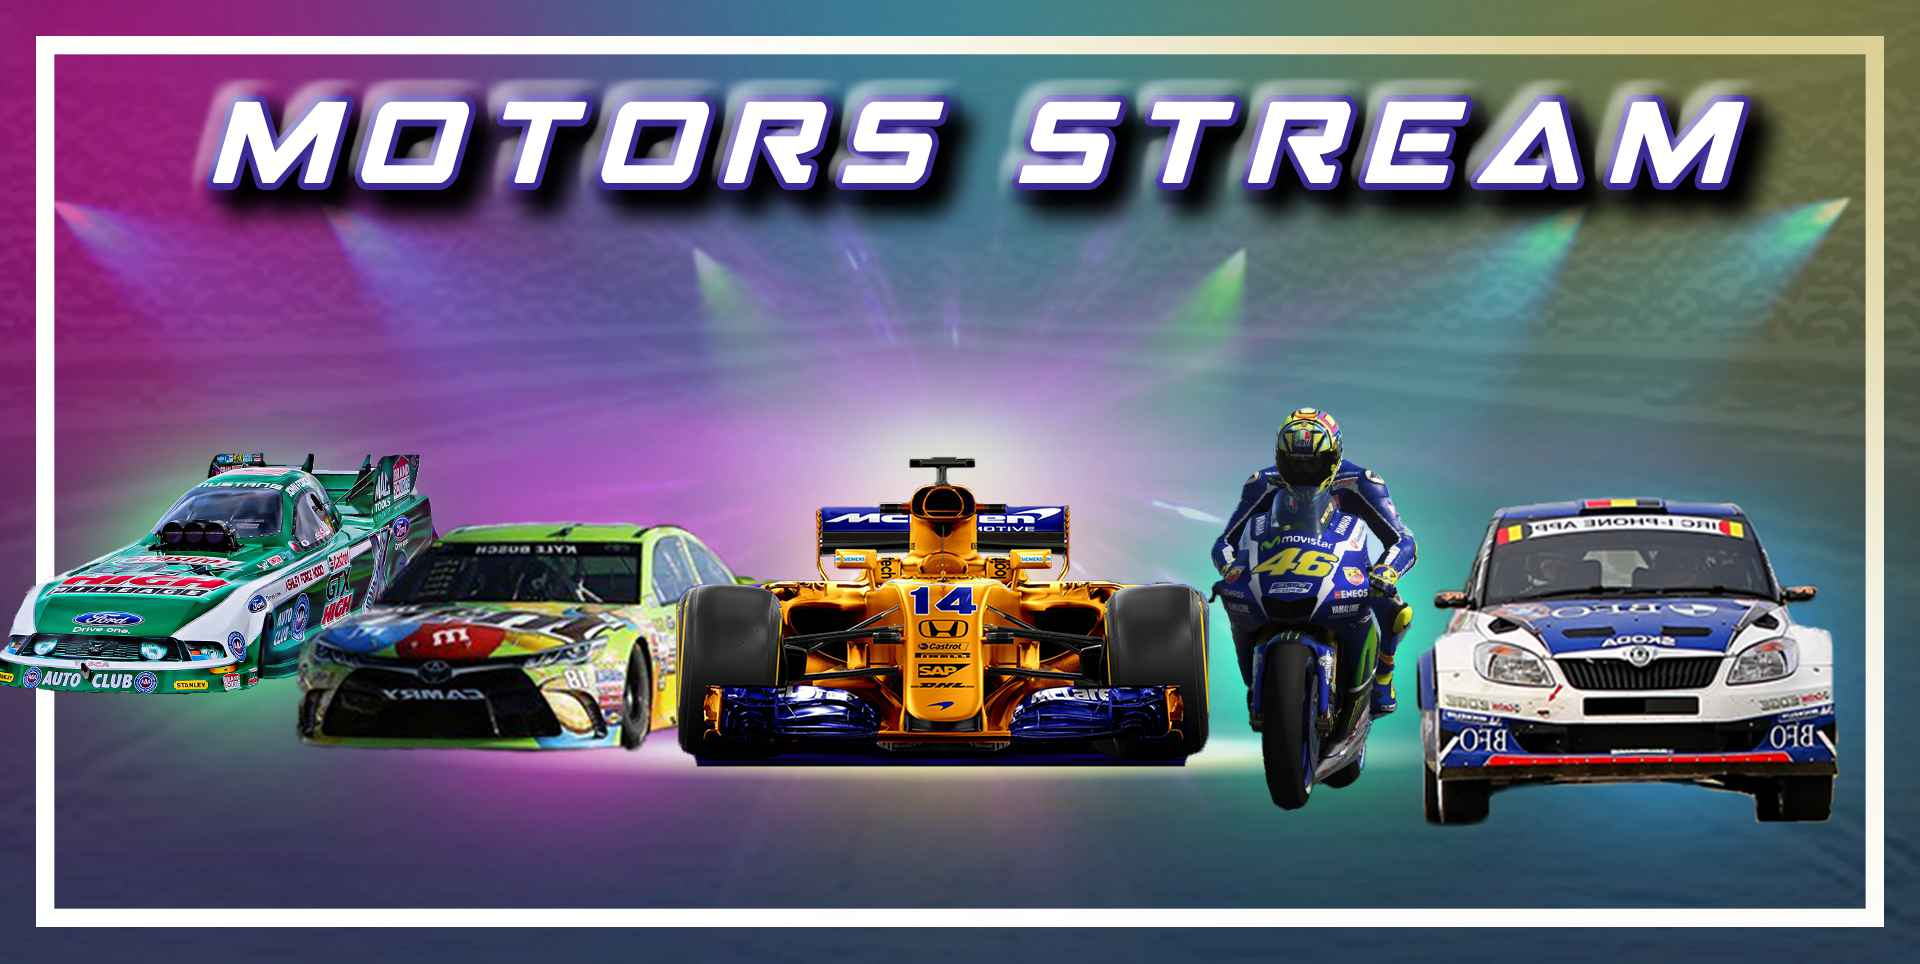 Live Malaysian F1 Grand Prix Streaming